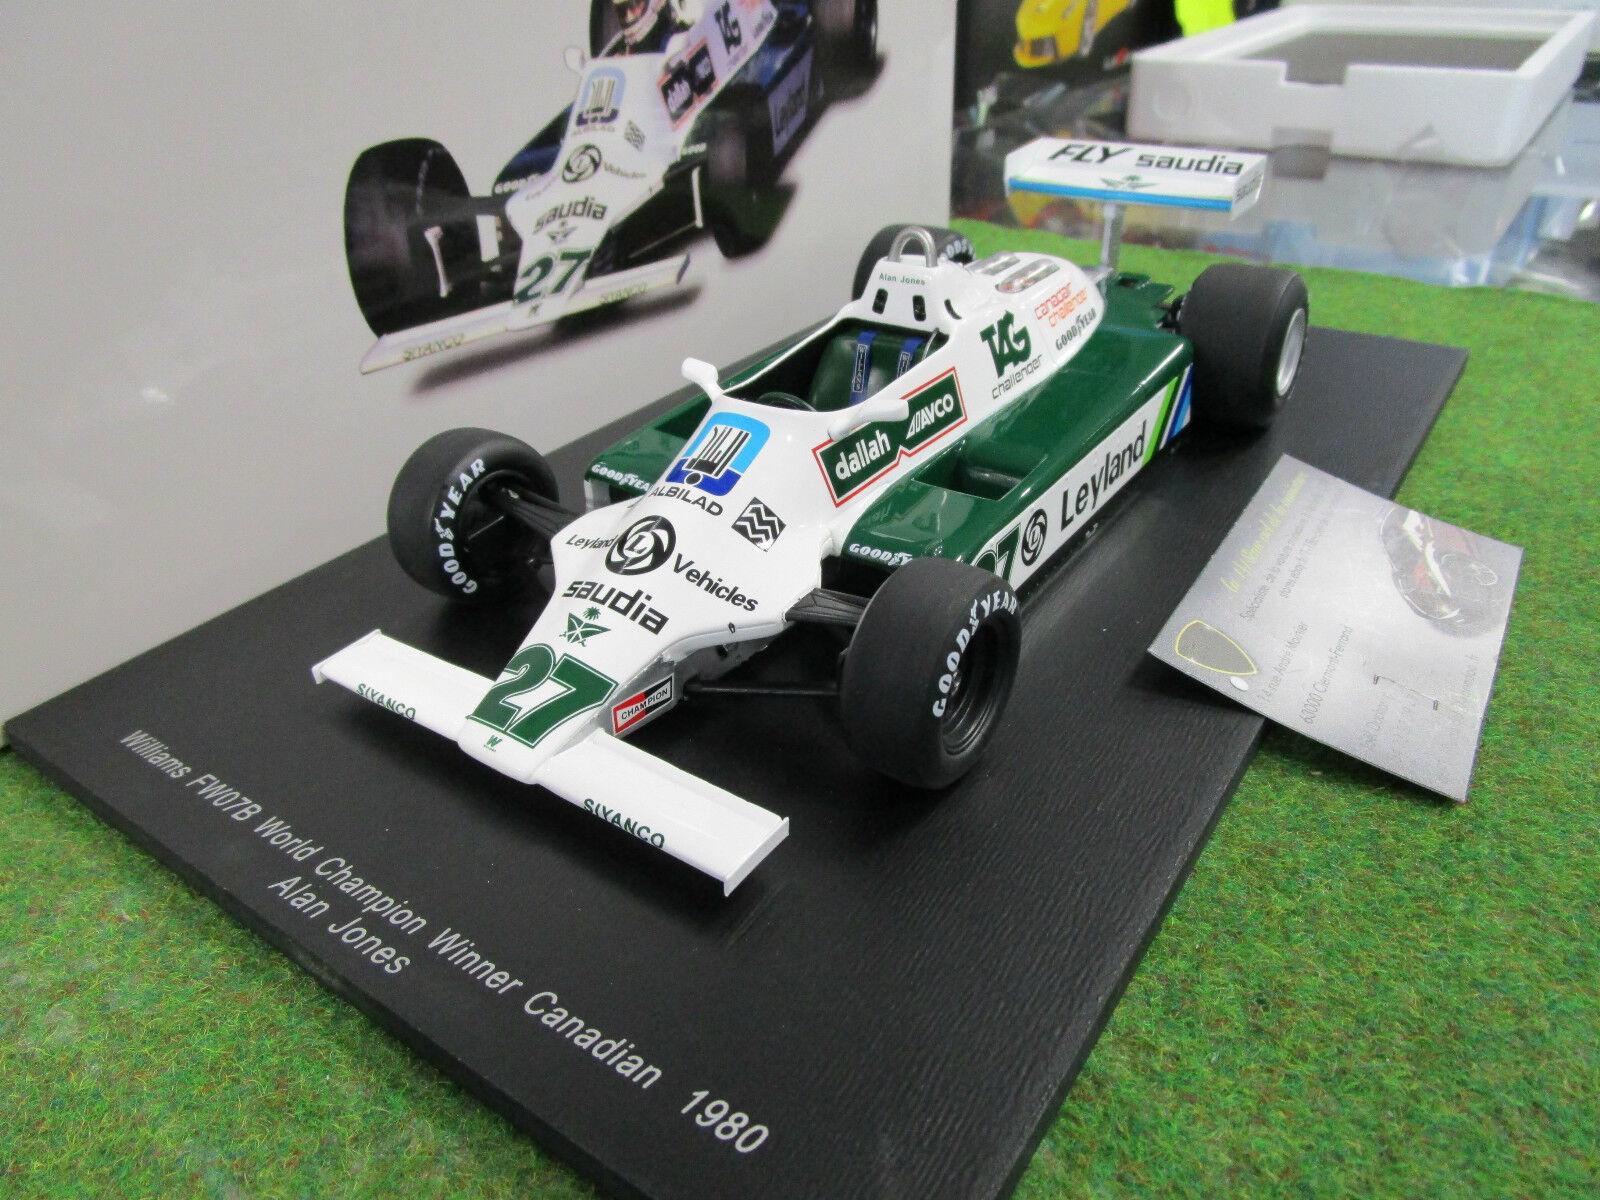 marcas de moda F1 WILLIAMS FW07B   27 27 27 World Champion 1980 A. JONES 1 18 SPARK 18S117 formule 1  muchas sorpresas